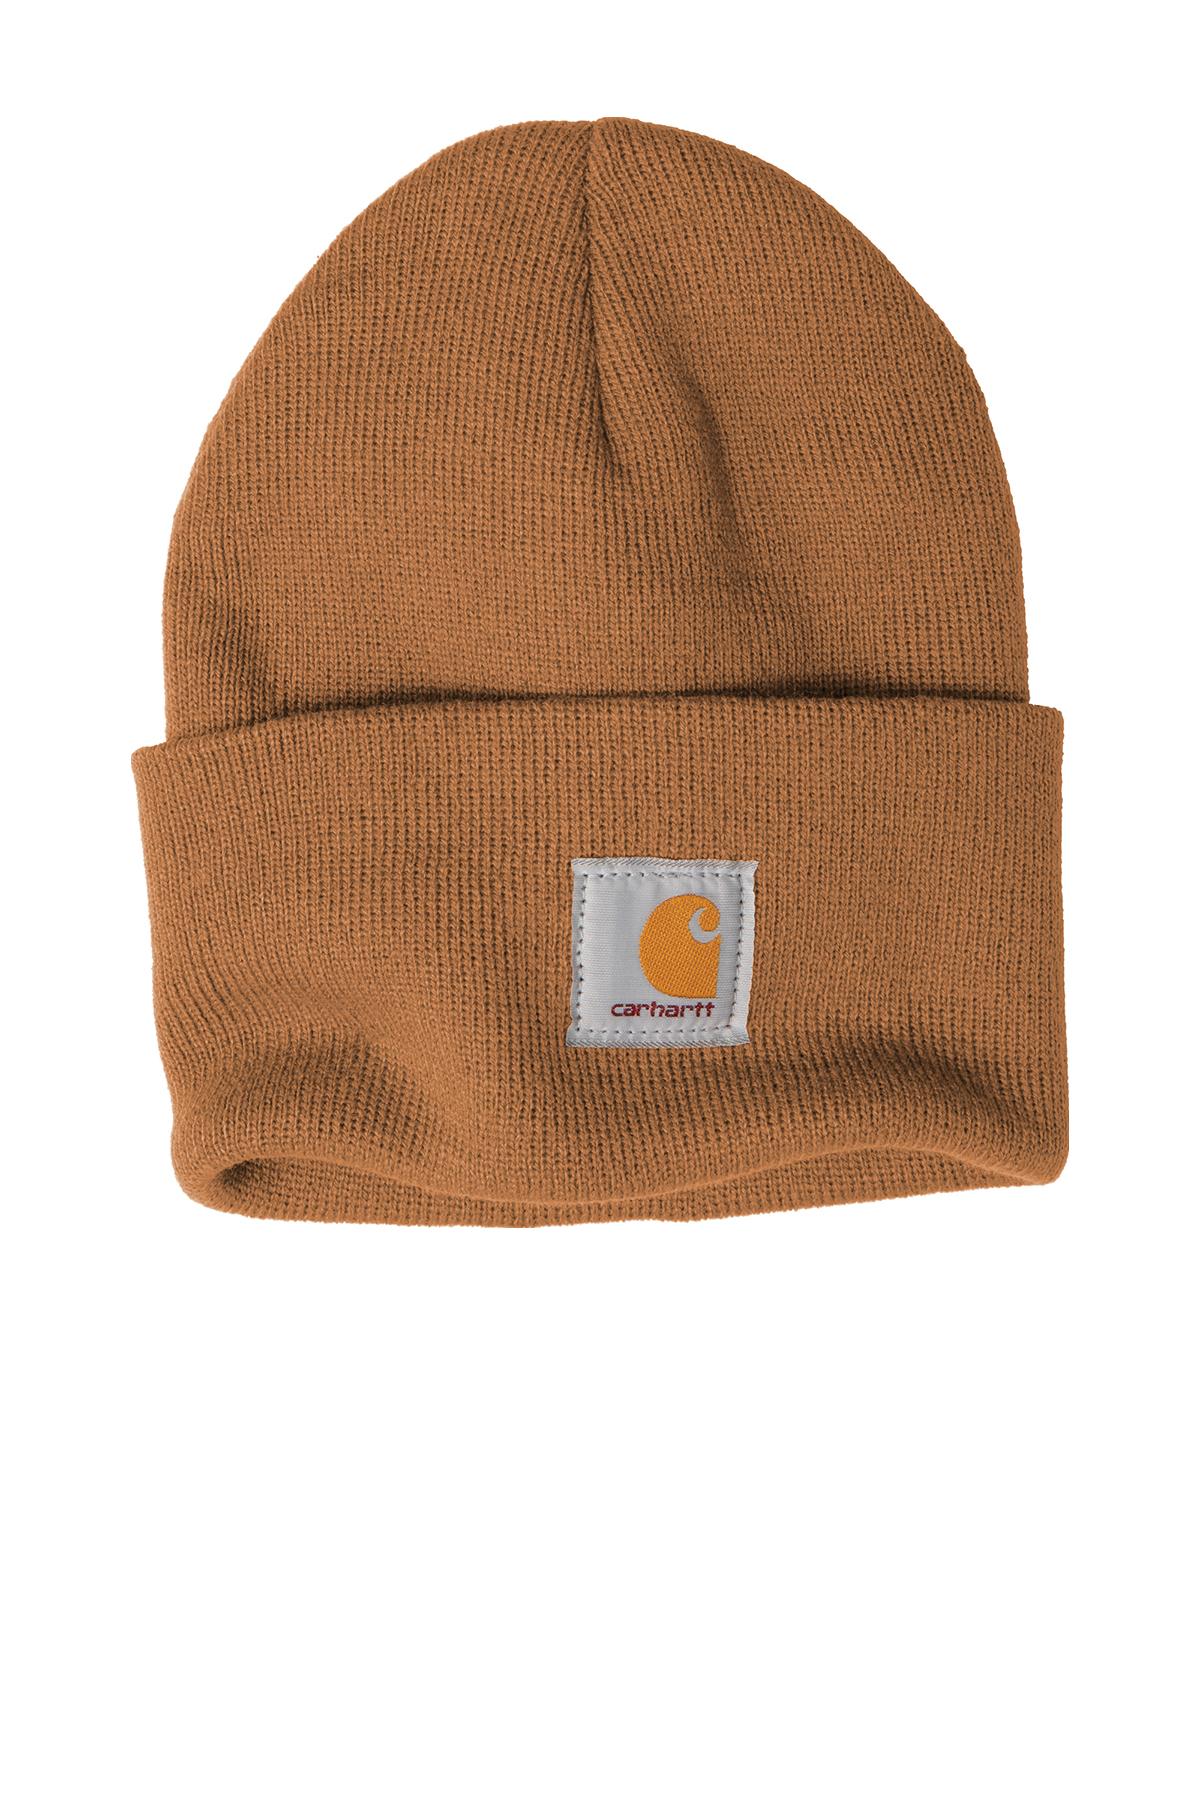 Carhartt Beanie Carhartt Hats Knitted Fabric